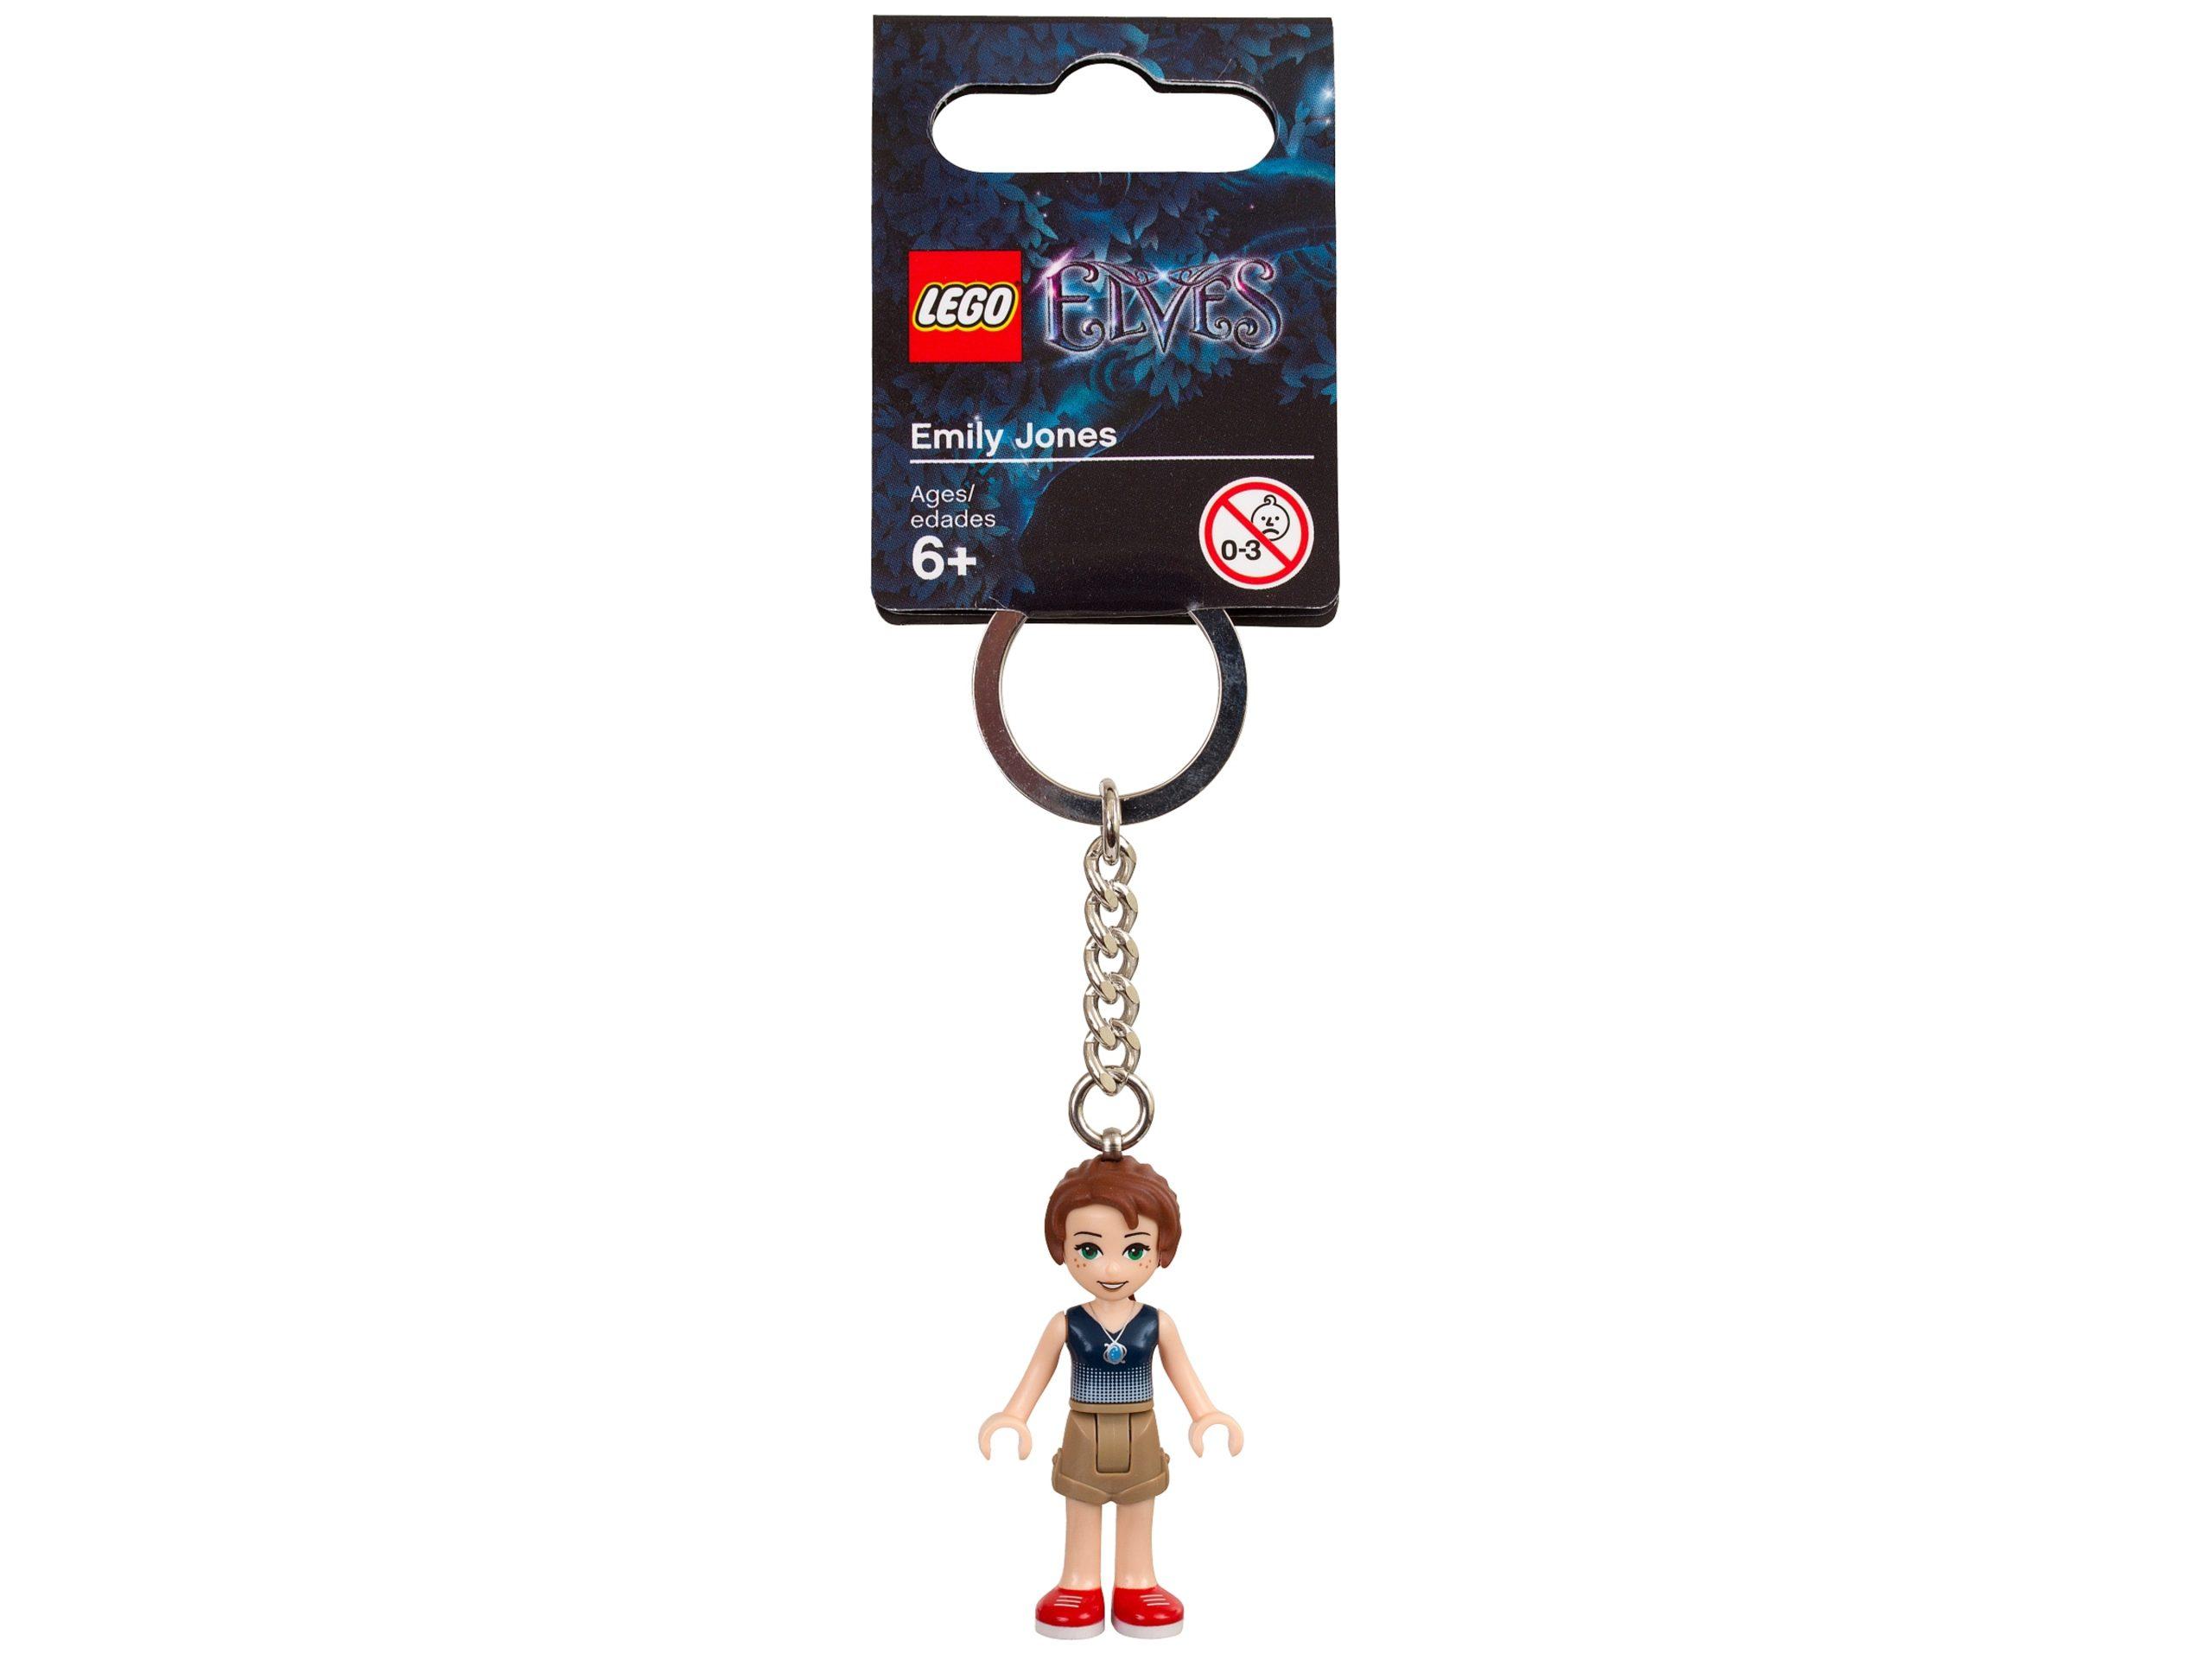 lego 853559 elves emily jones key chain scaled